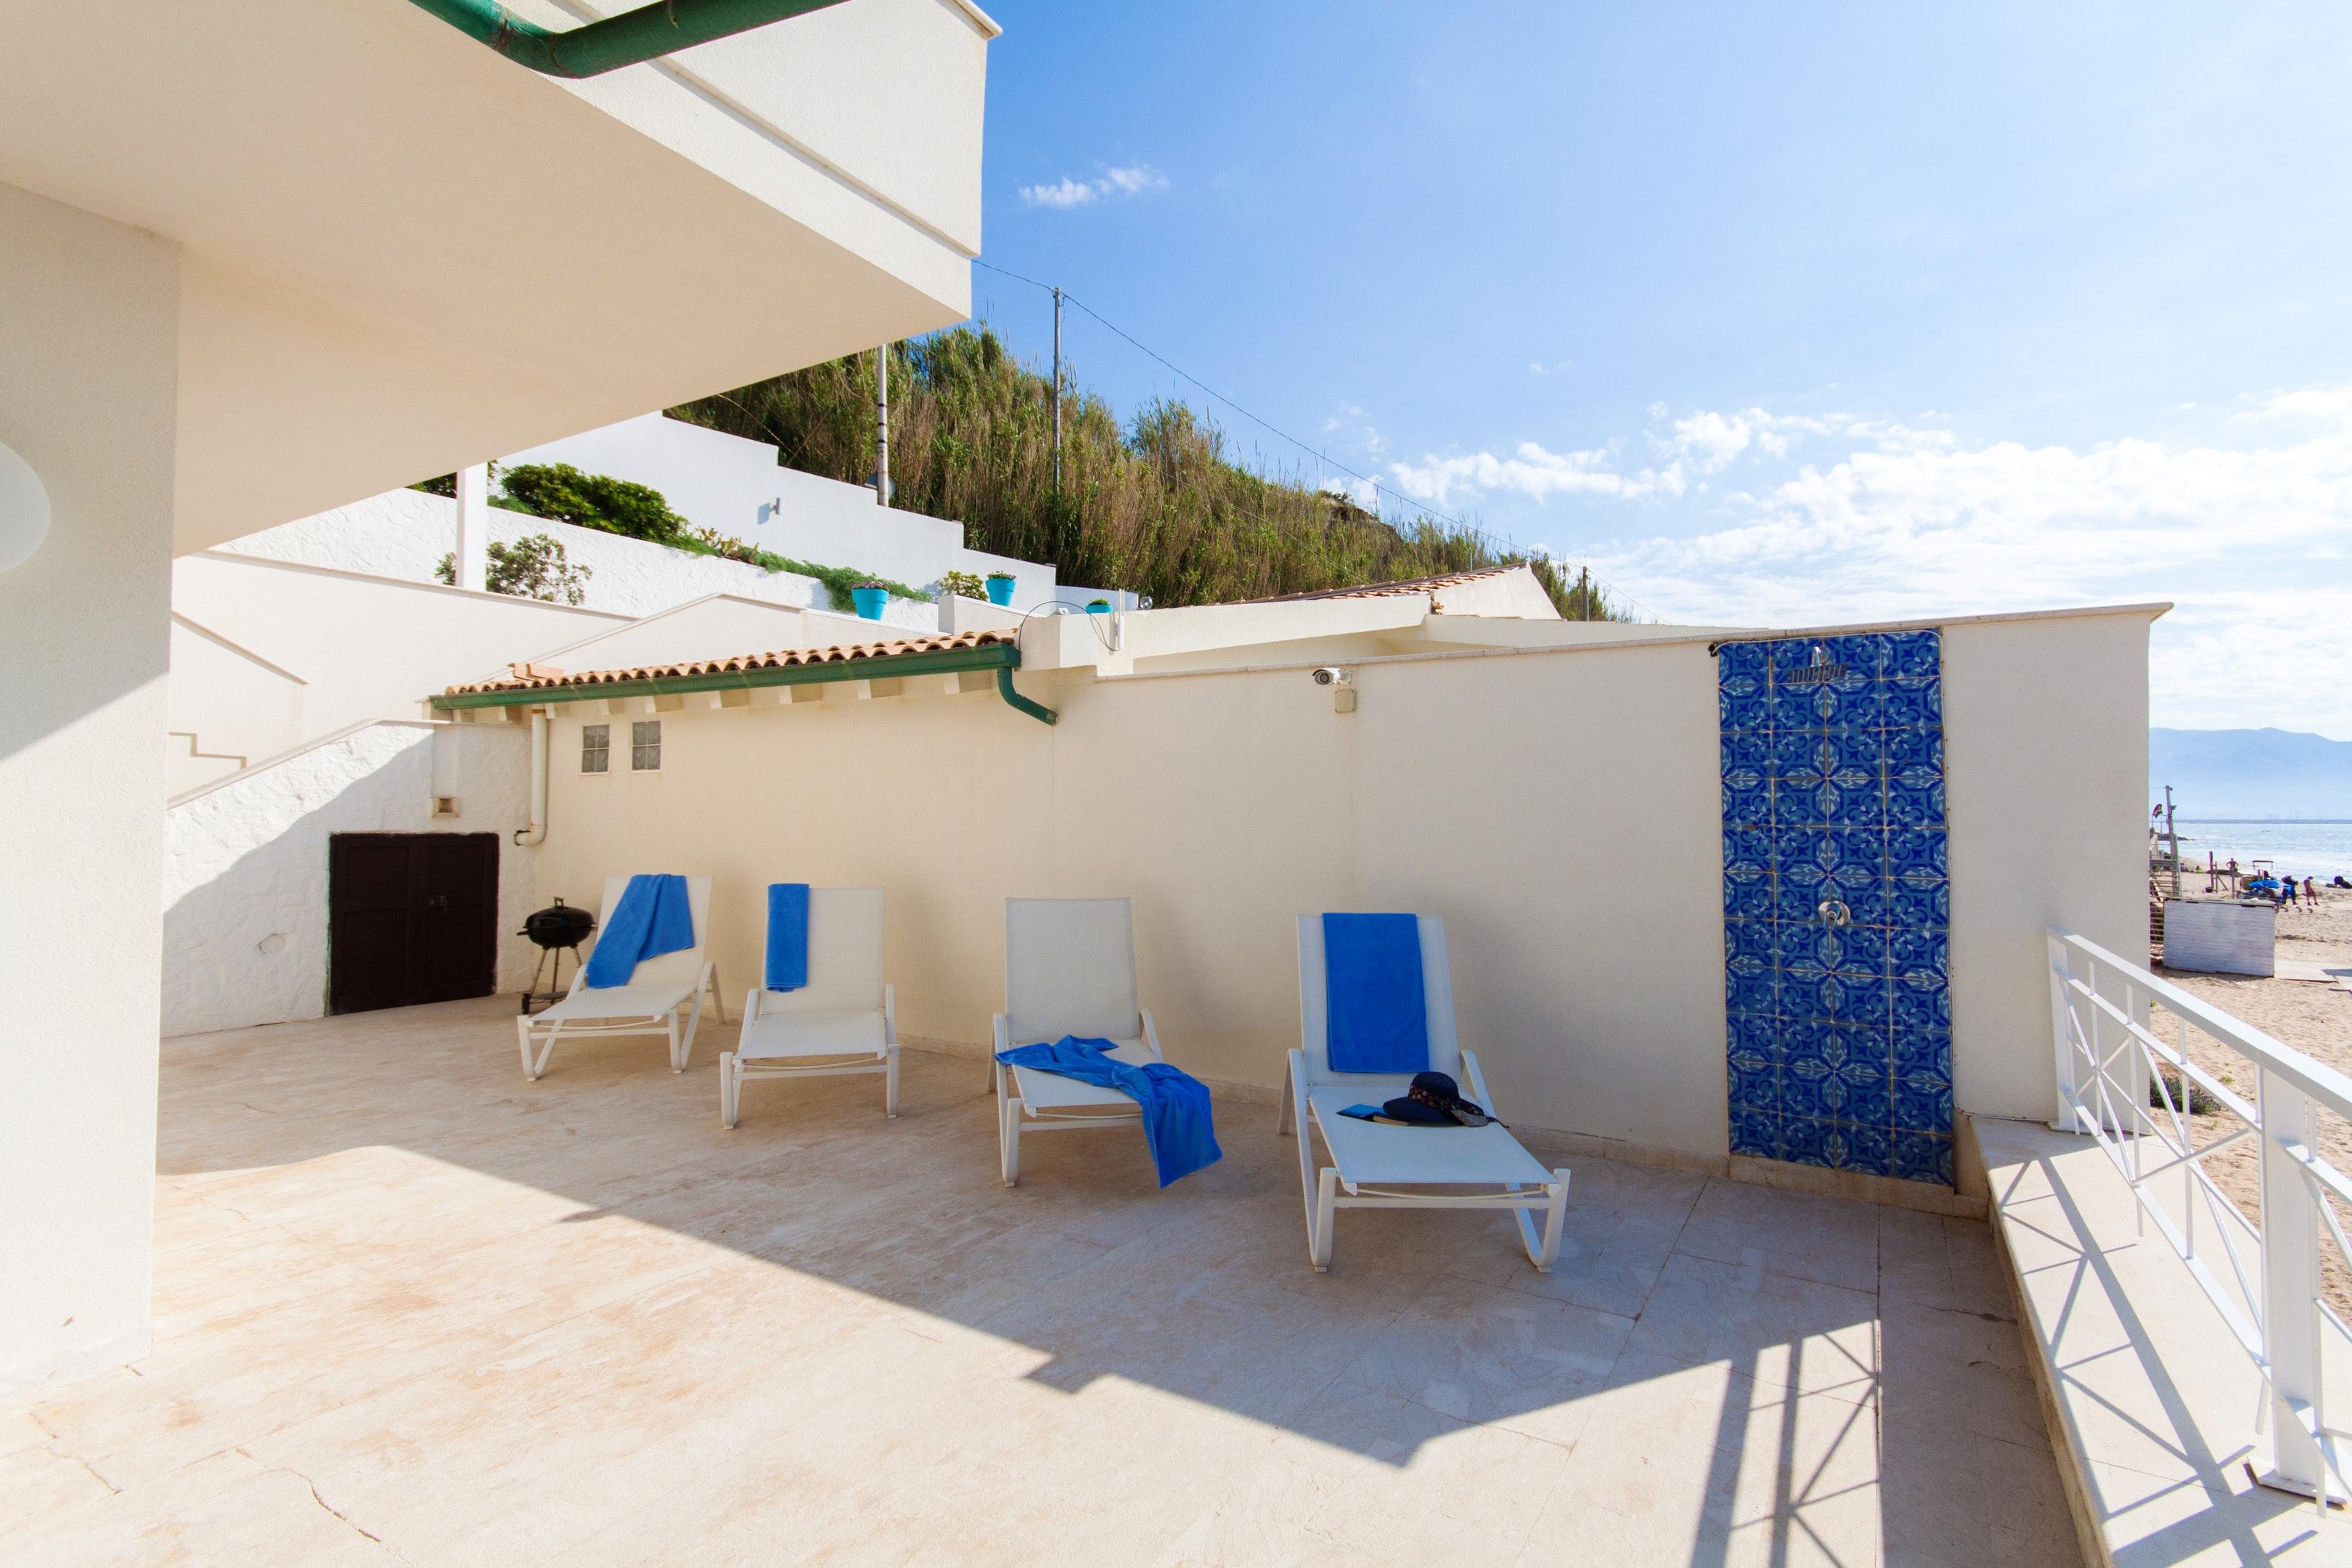 Holiday apartment Wohnung mit 4 Schlafzimmern in Piano di Trappeto mit herrlichem Meerblick, möblierter Terr (2236750), Balestrate, Palermo, Sicily, Italy, picture 6